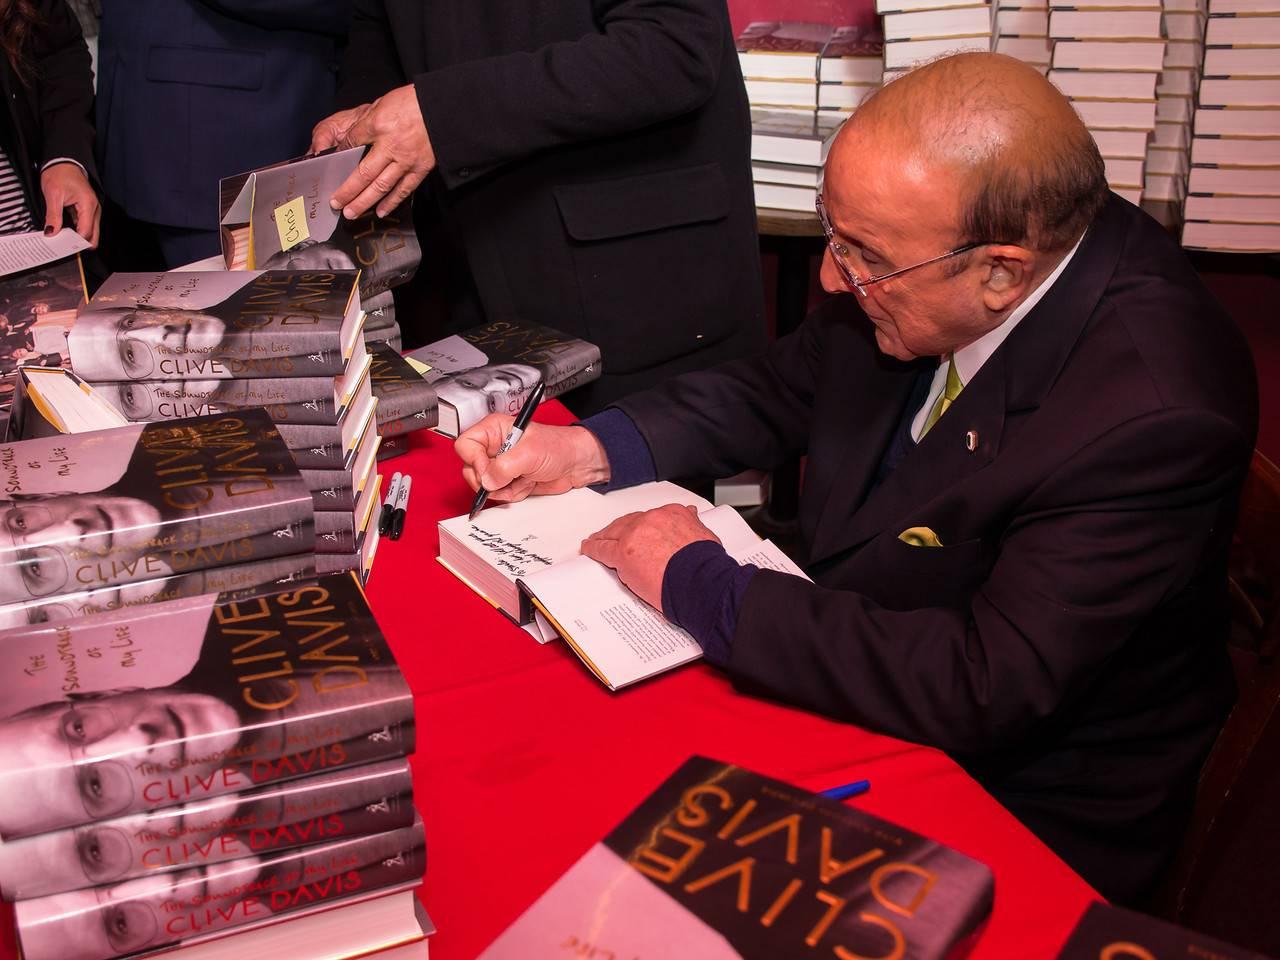 Clive Davis signing his new book at Beach Blanket Babylon.  Photo Credit (all): Rick Markovich